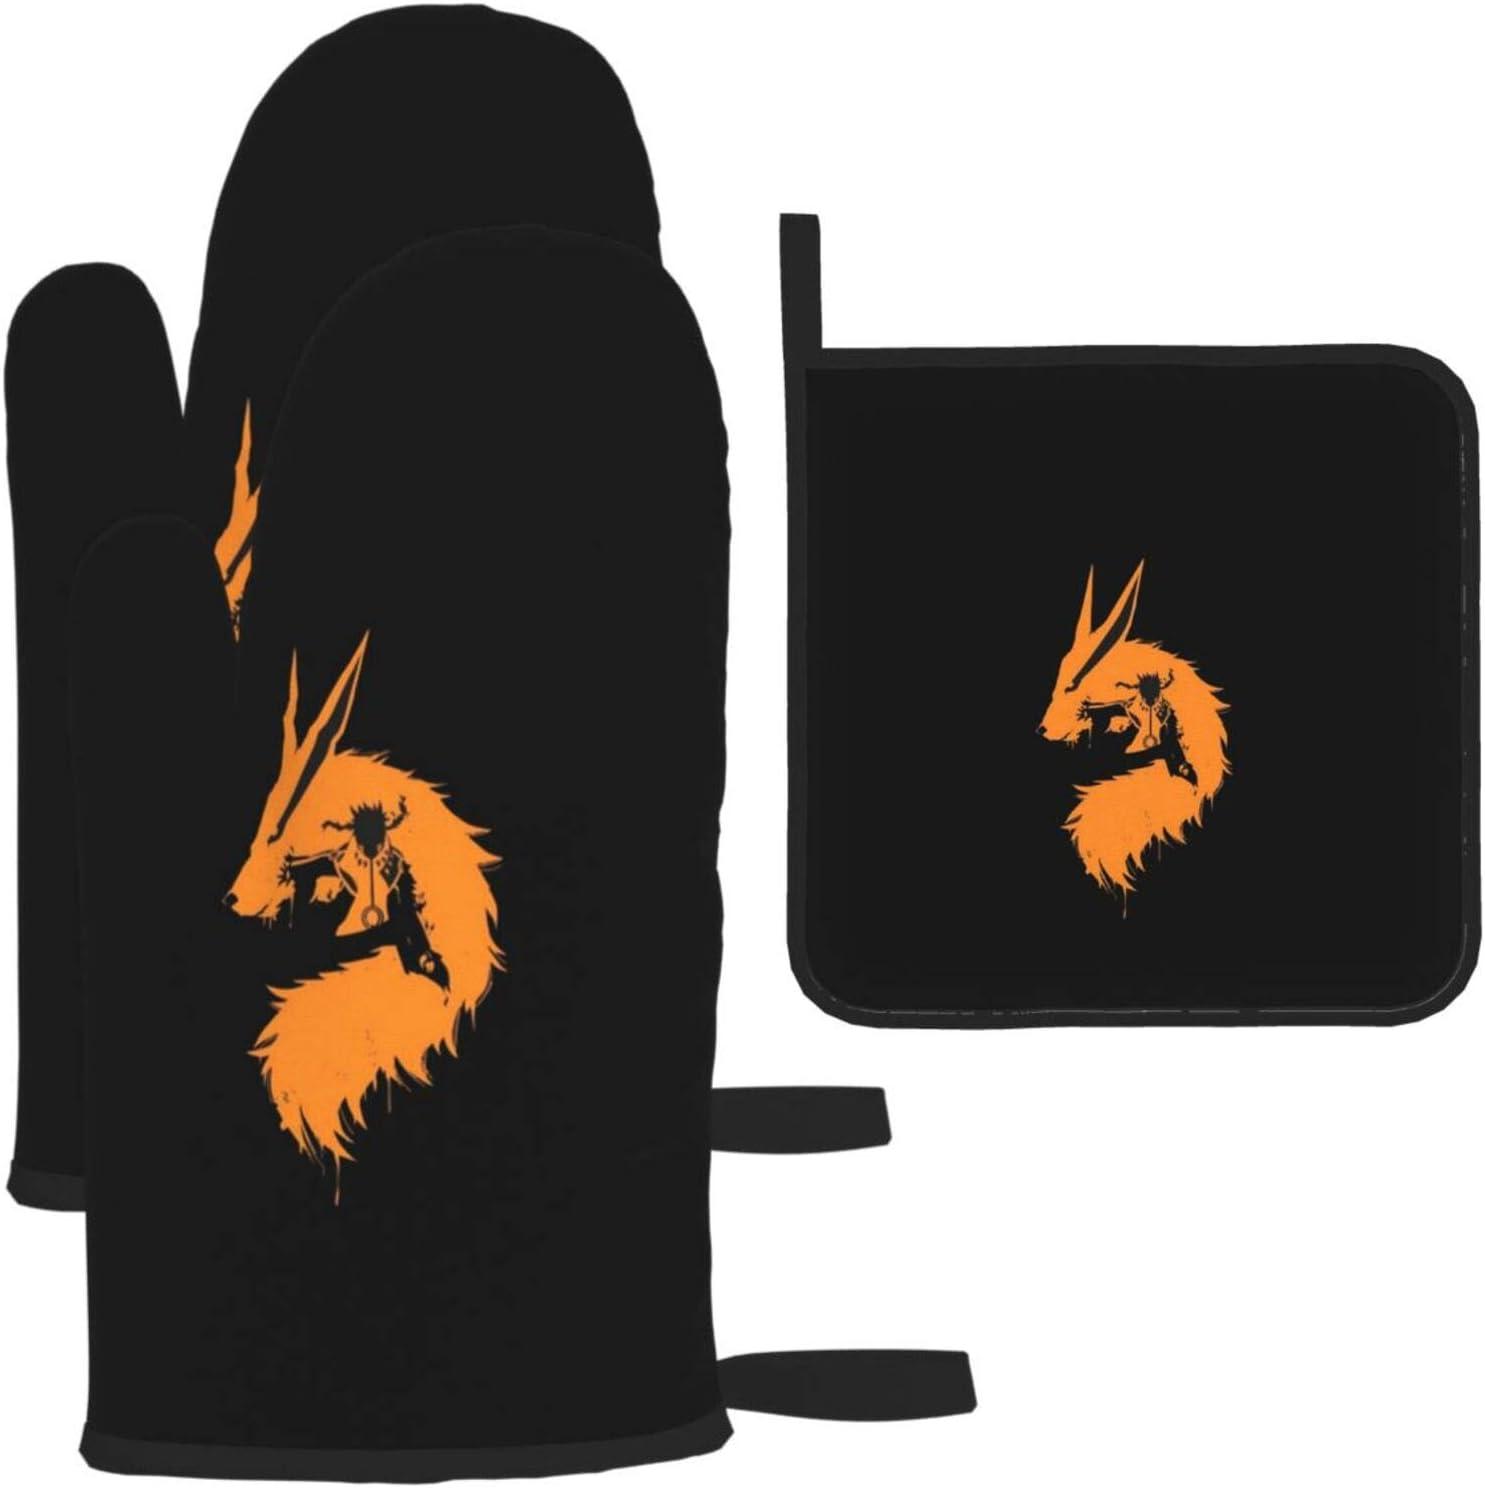 Super intense SALE Kurama Heat Resistant Extra Long Oven Rare Holders Reus Pot and Mitt